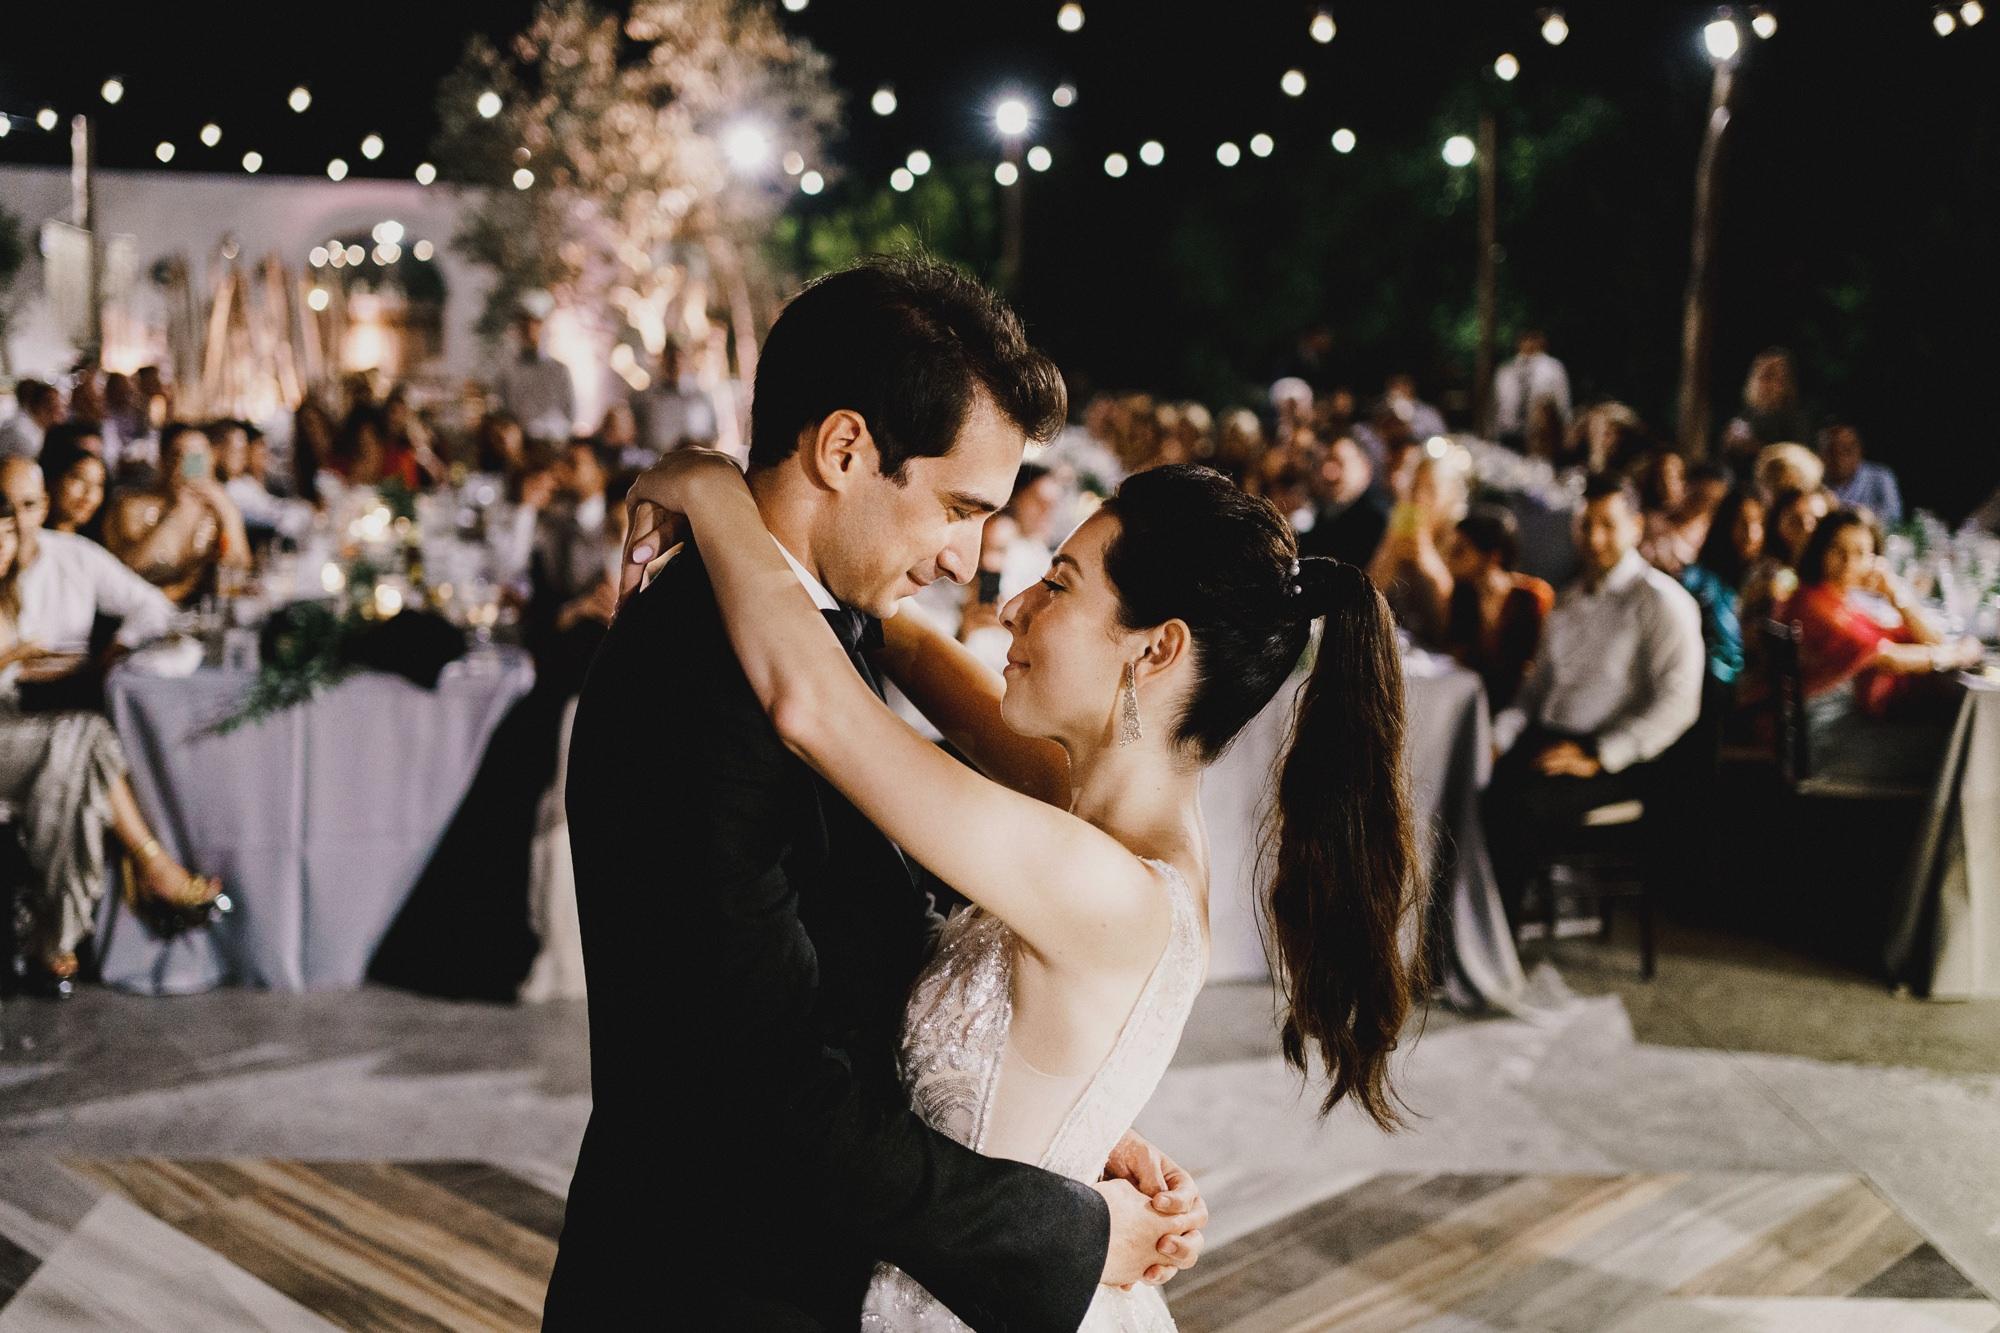 Aelia Cyprus Wedding Photography and Film